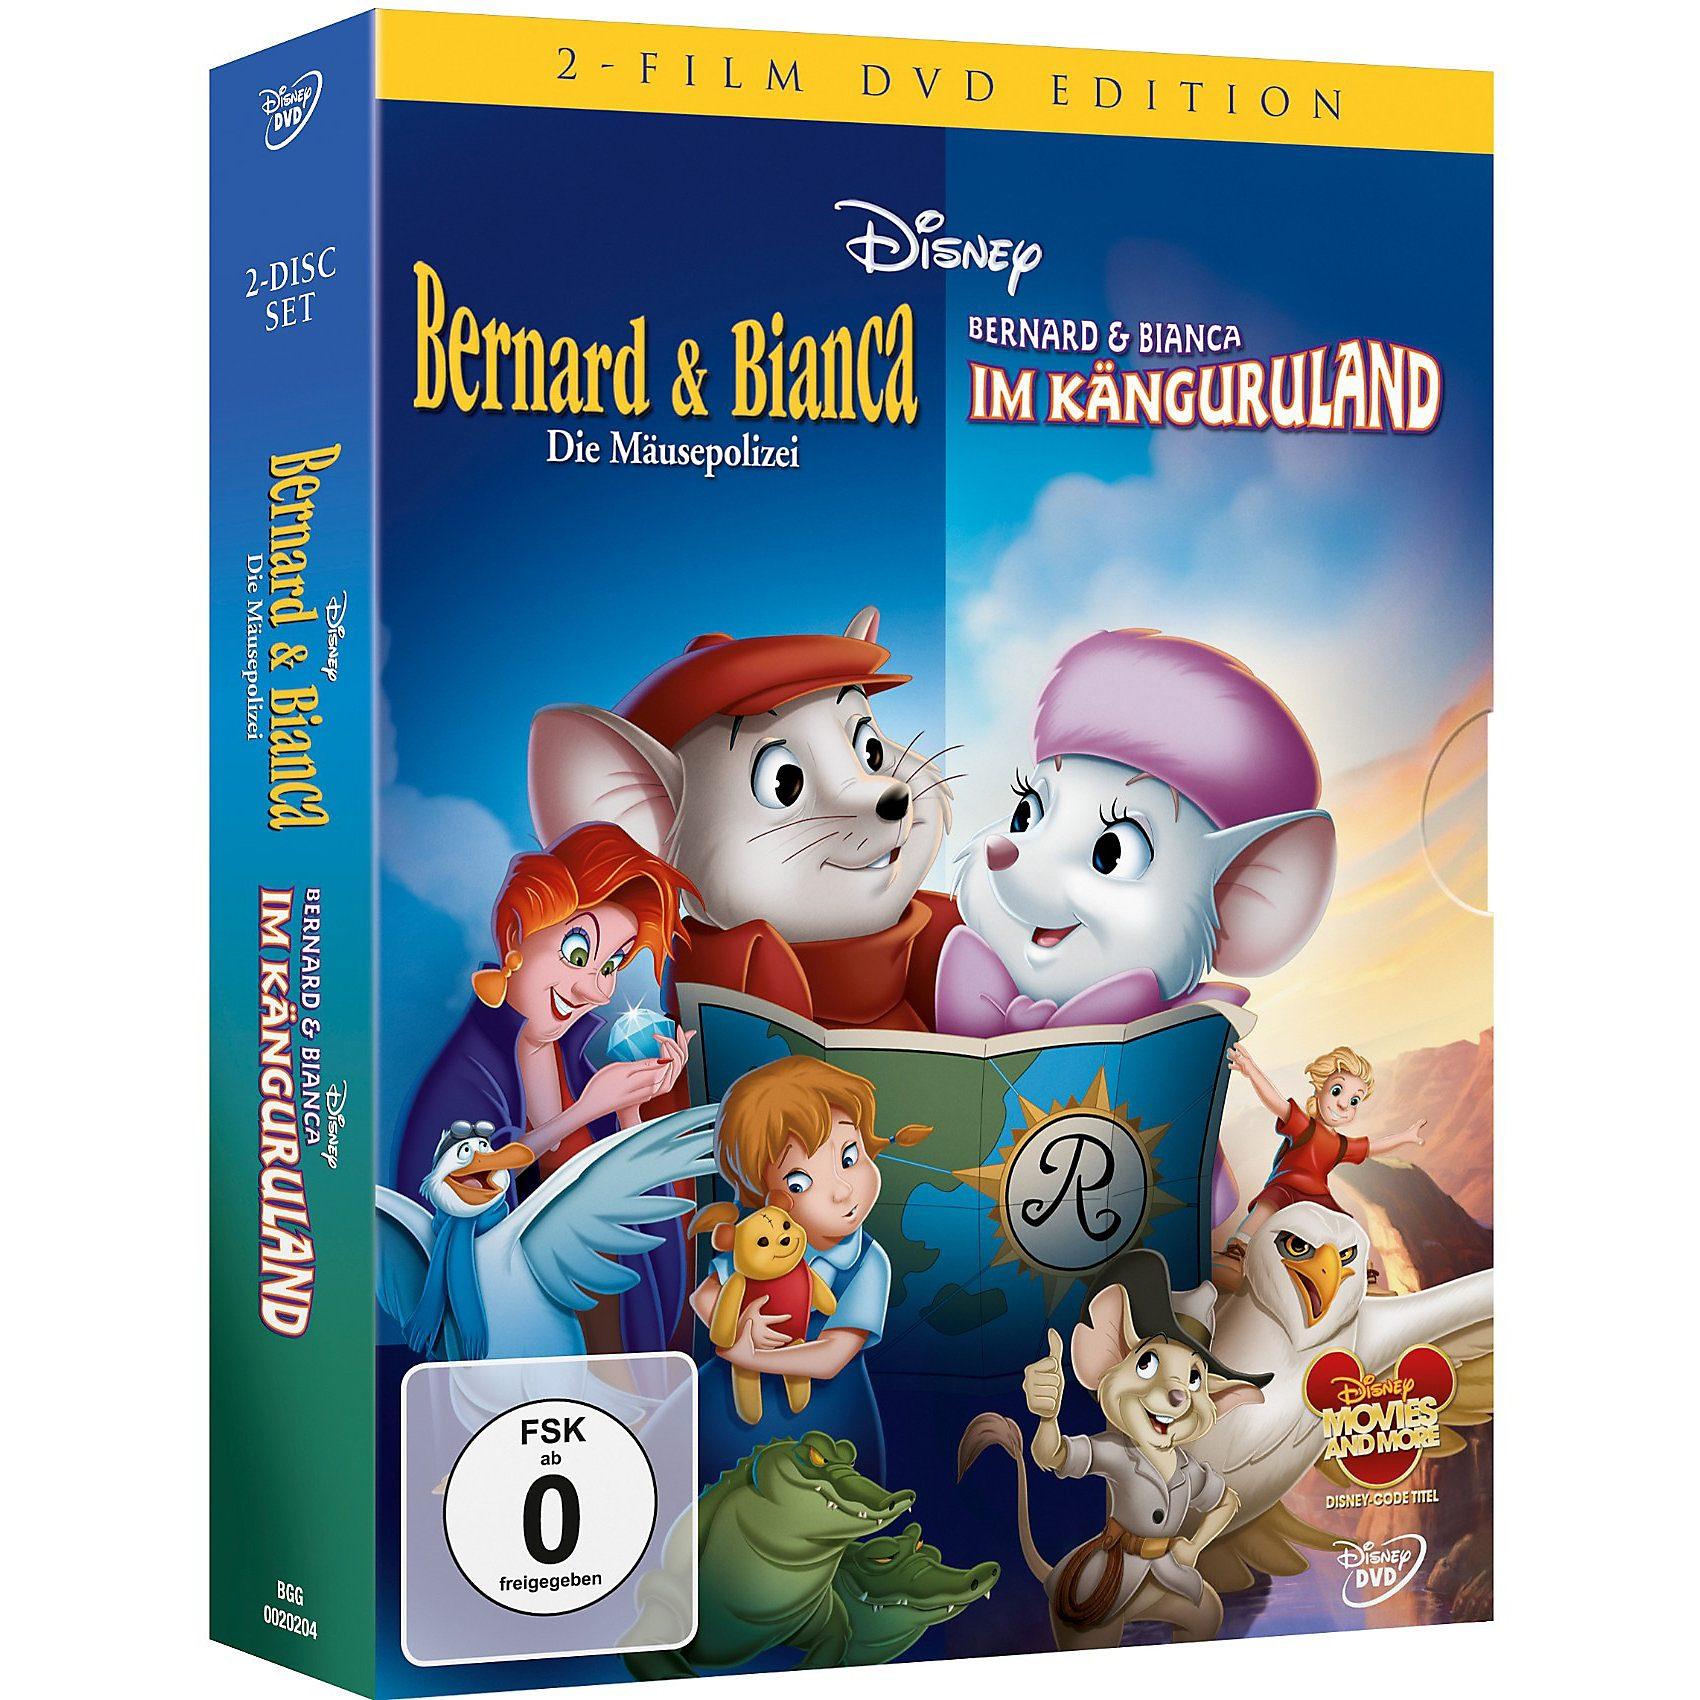 Disney DVD DVD Disneys Bernard und Bianca - Doppelpack (Teil 1+2)